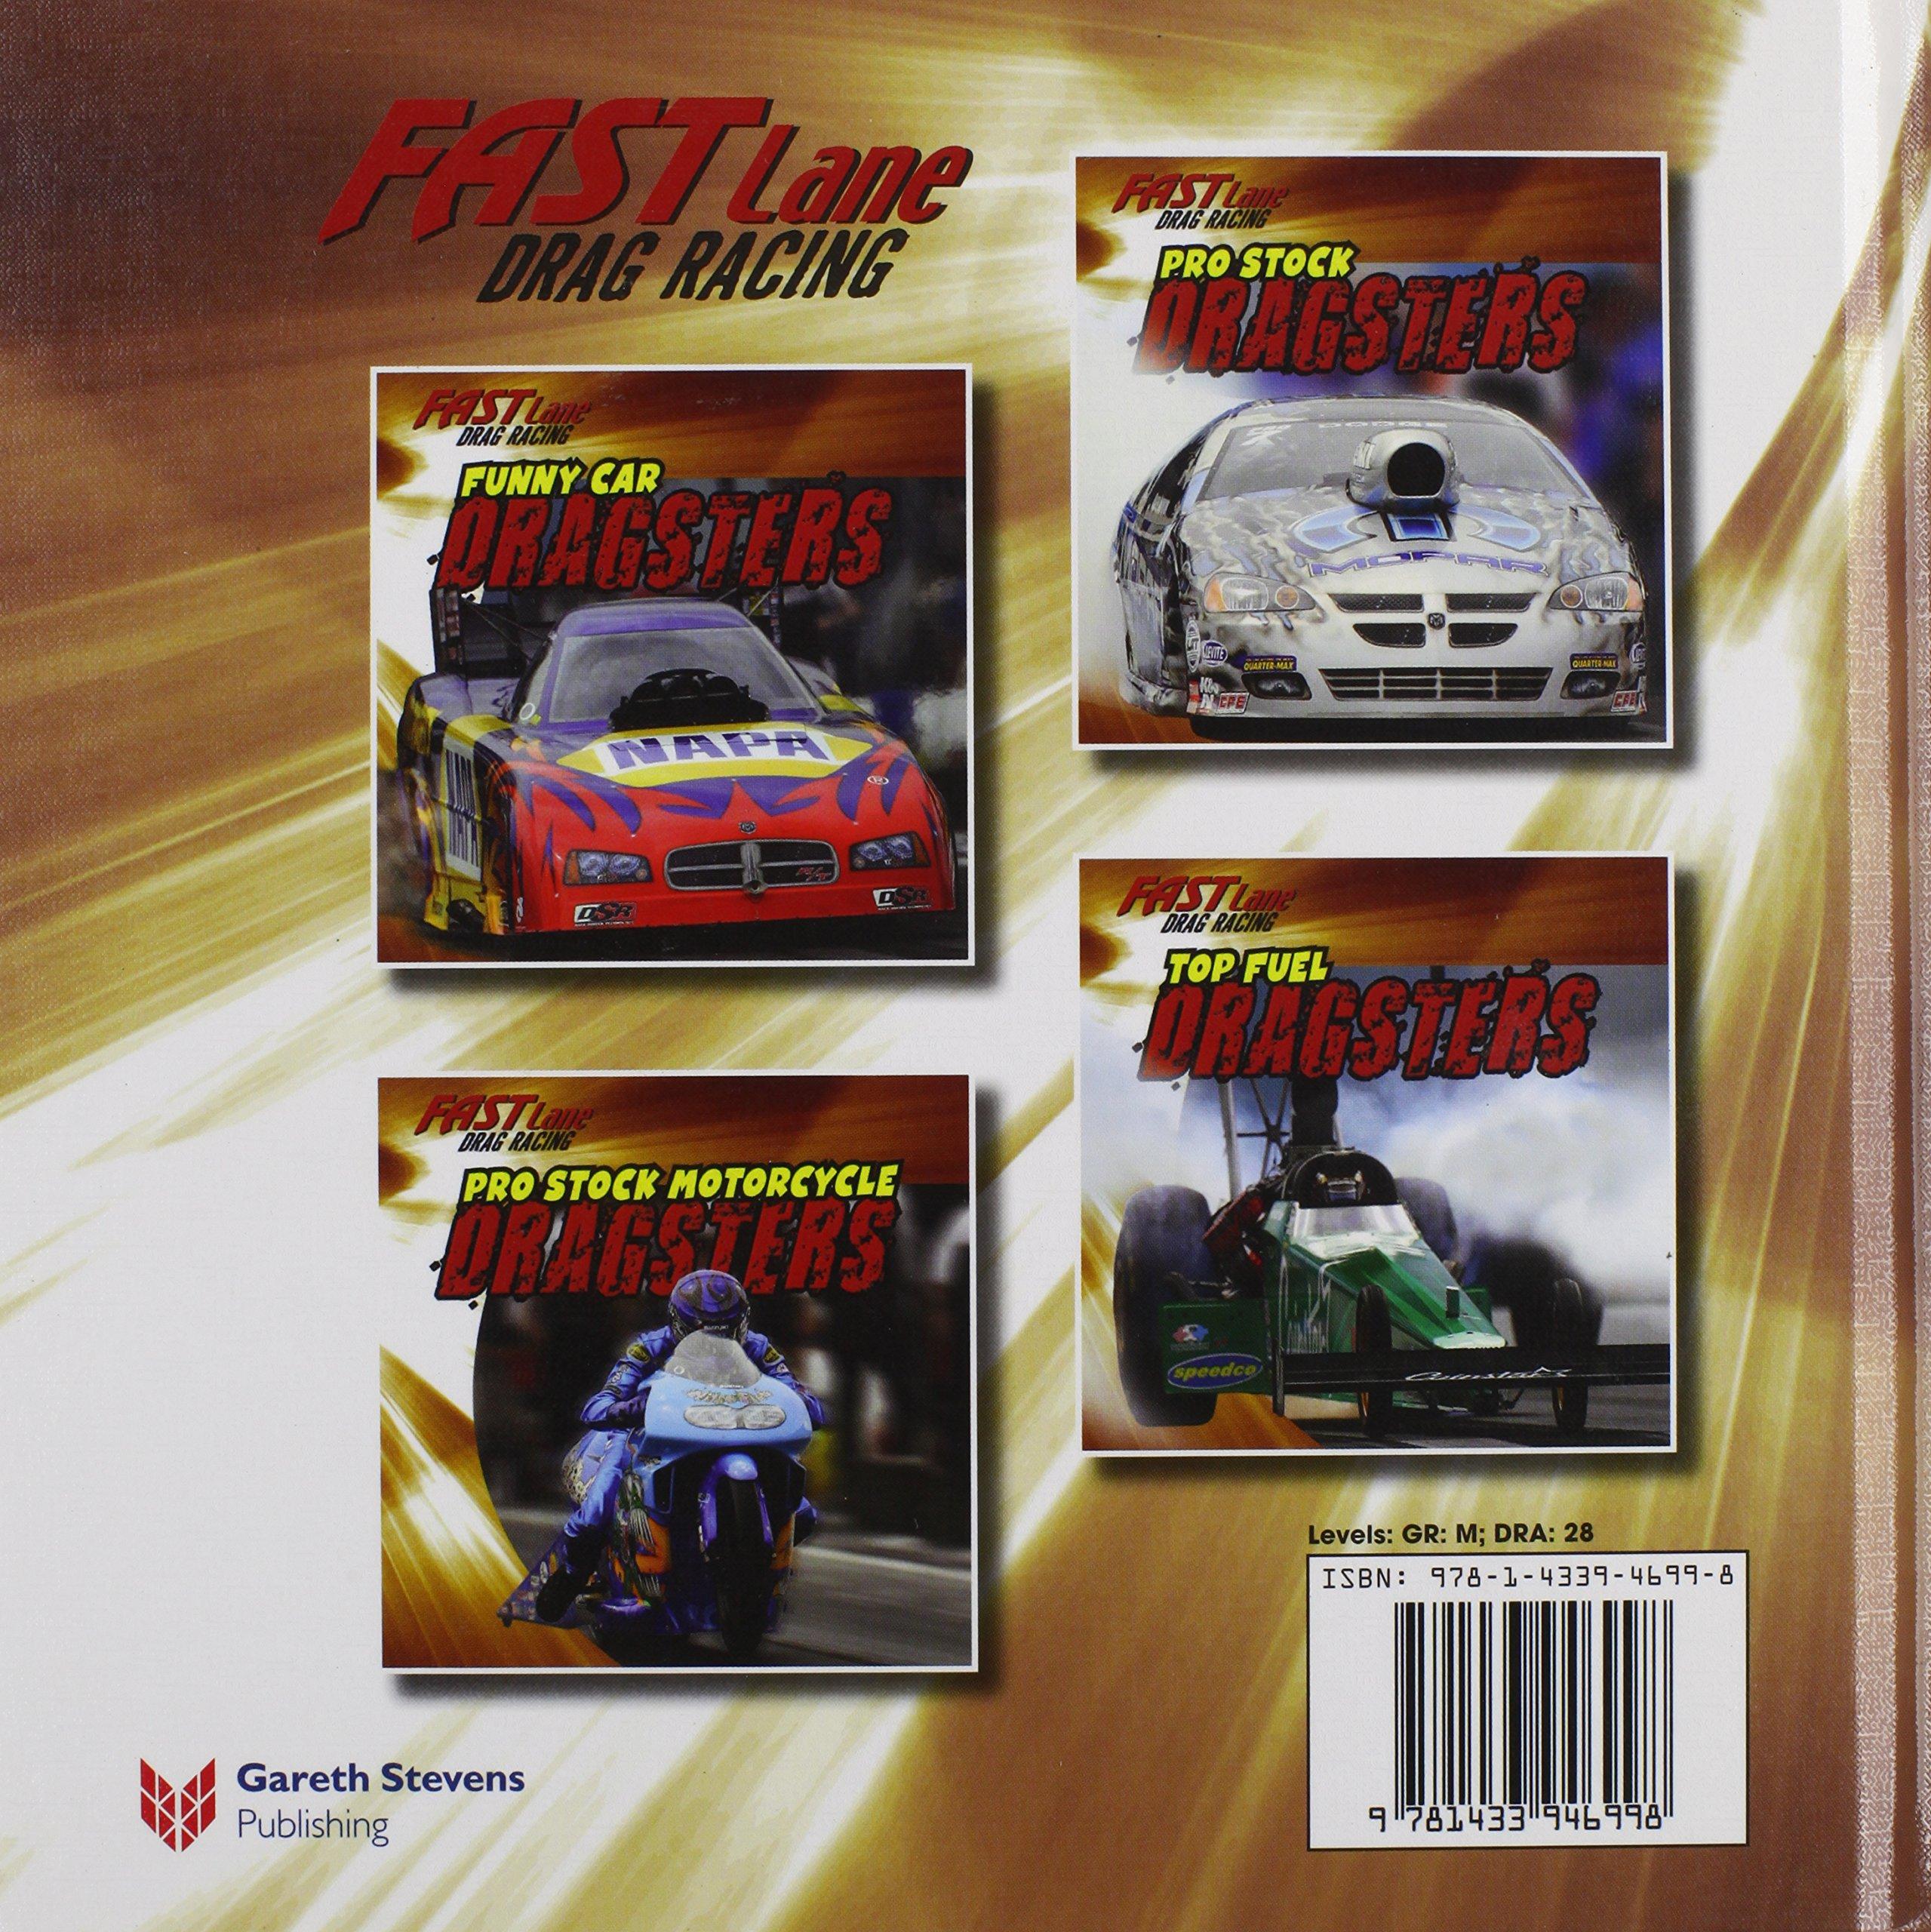 Pro Stock Dragsters (Fast Lane, Drag Racing): Tyrone Georgiou ...